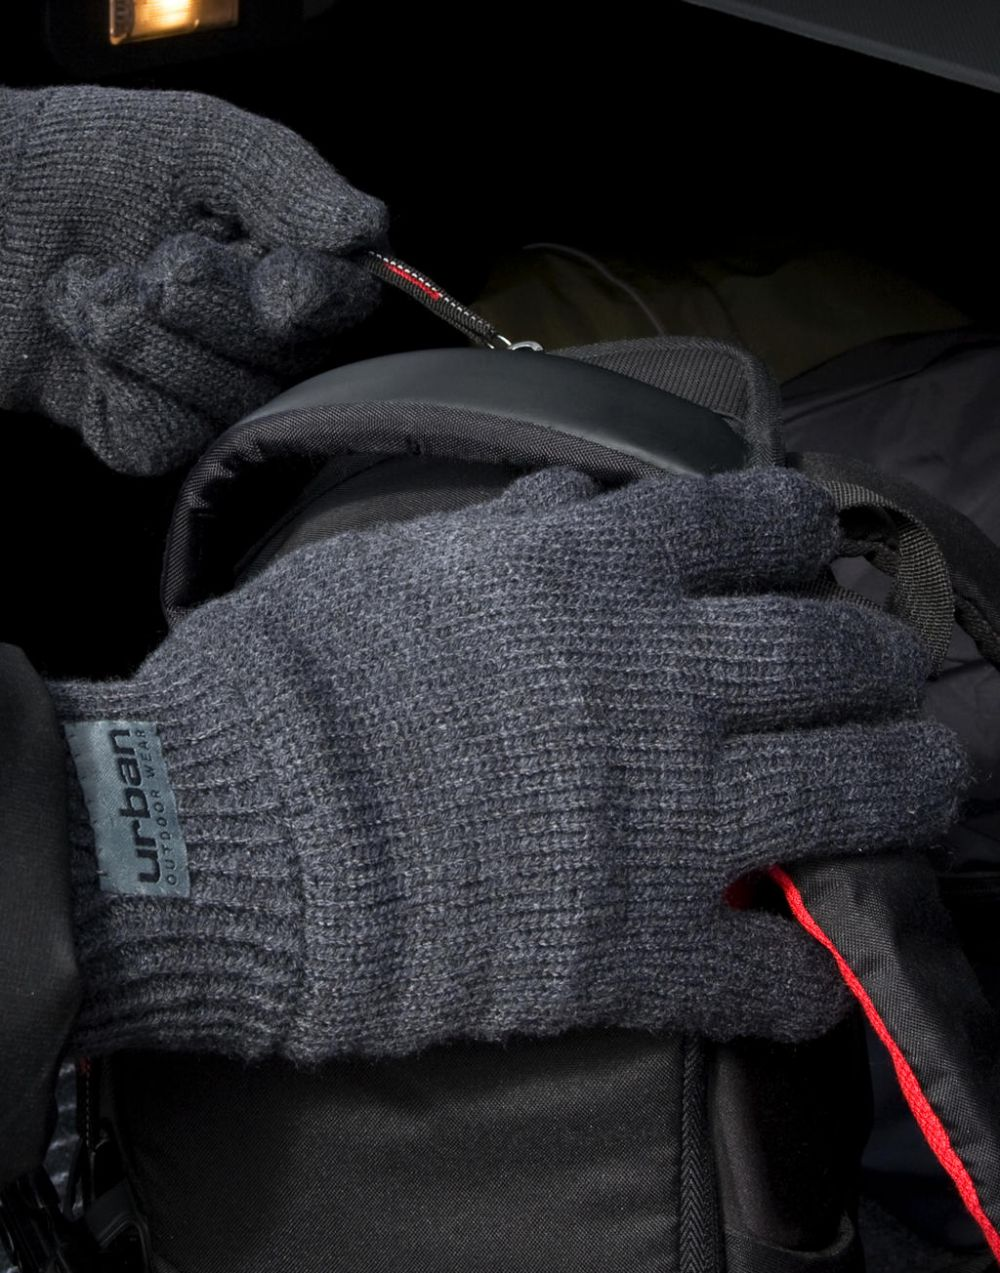 Guantes invierno result guantes thinsulate con forro con publicidad vista 1